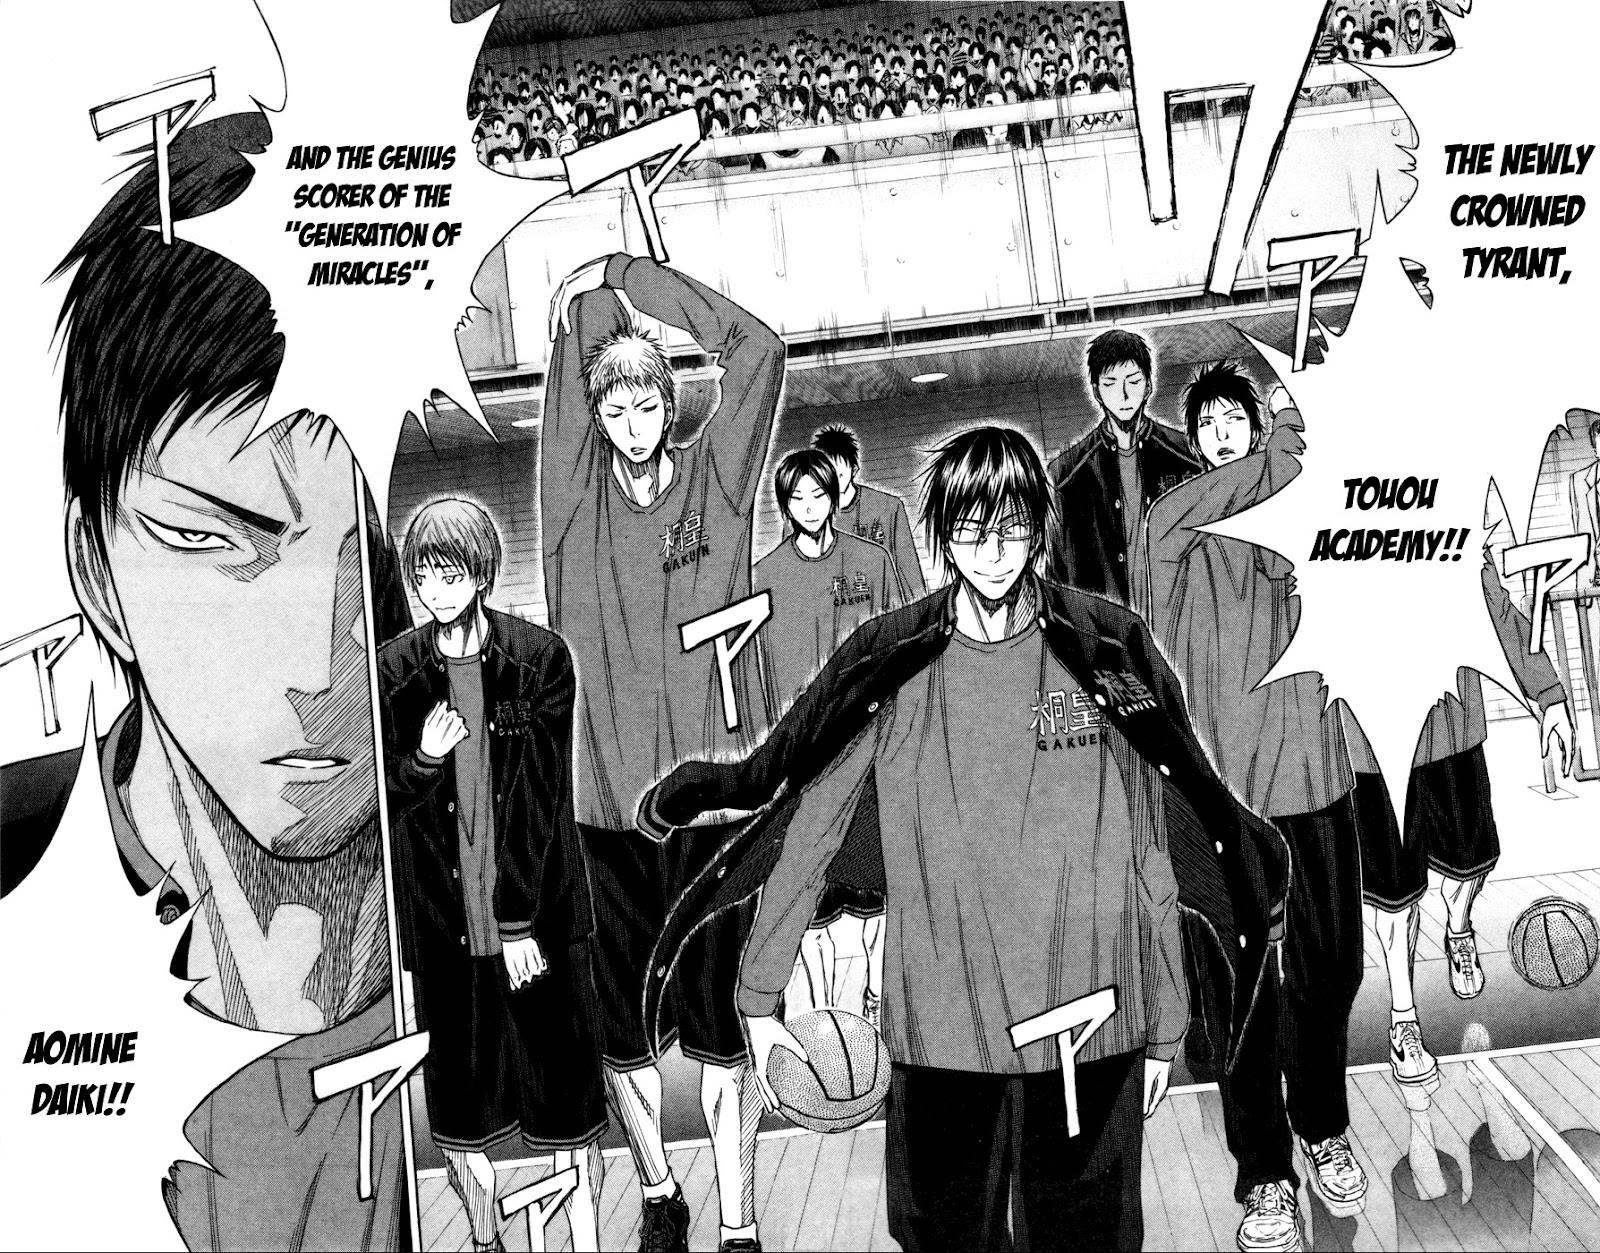 Kuroko no Basket Manga Chapter 114 - Image 10-11